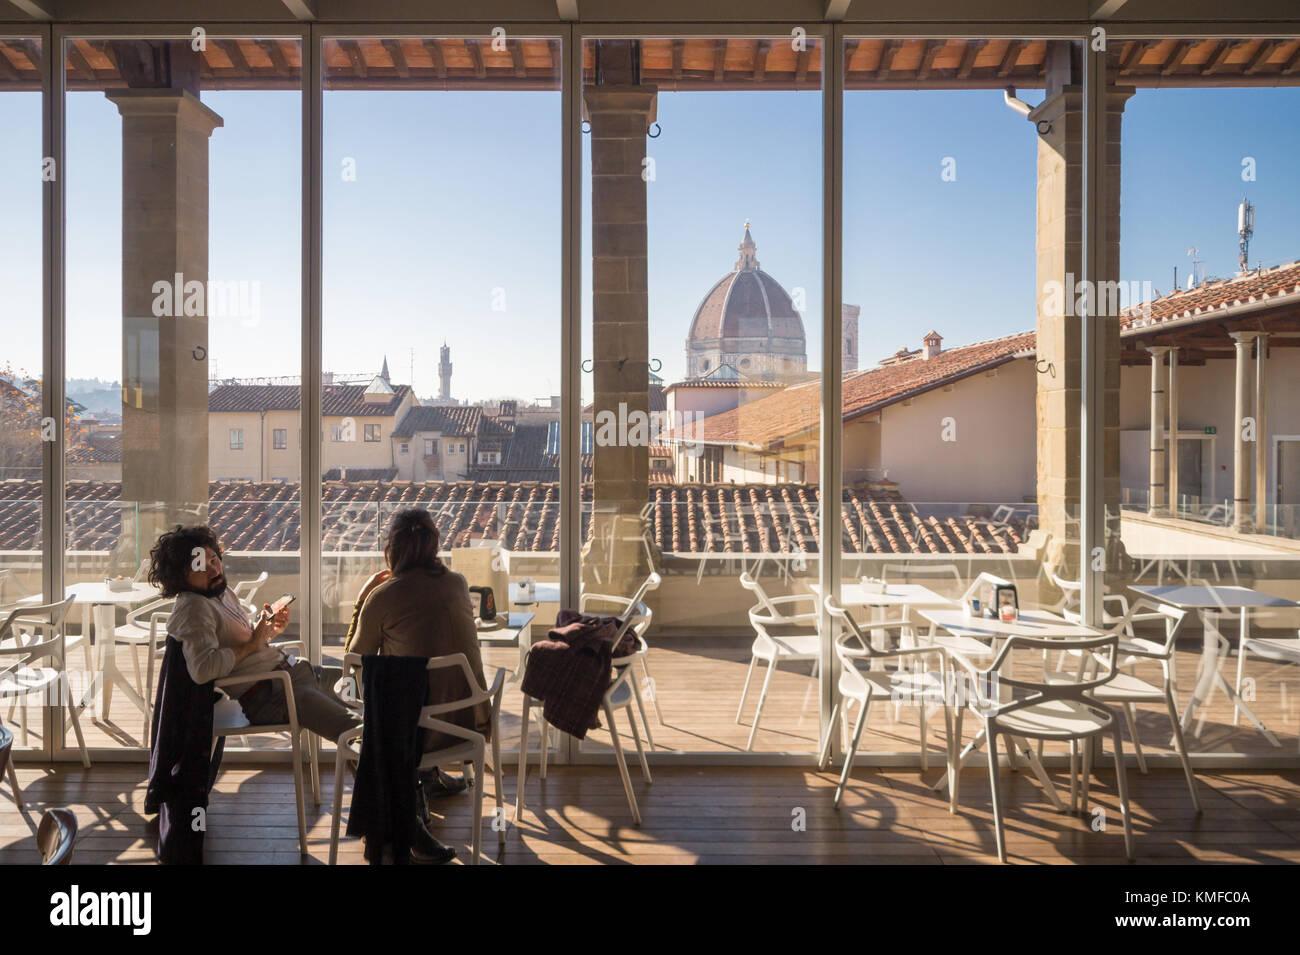 Museo Degli Innocenti Hospital Of The Innocents Panoramic